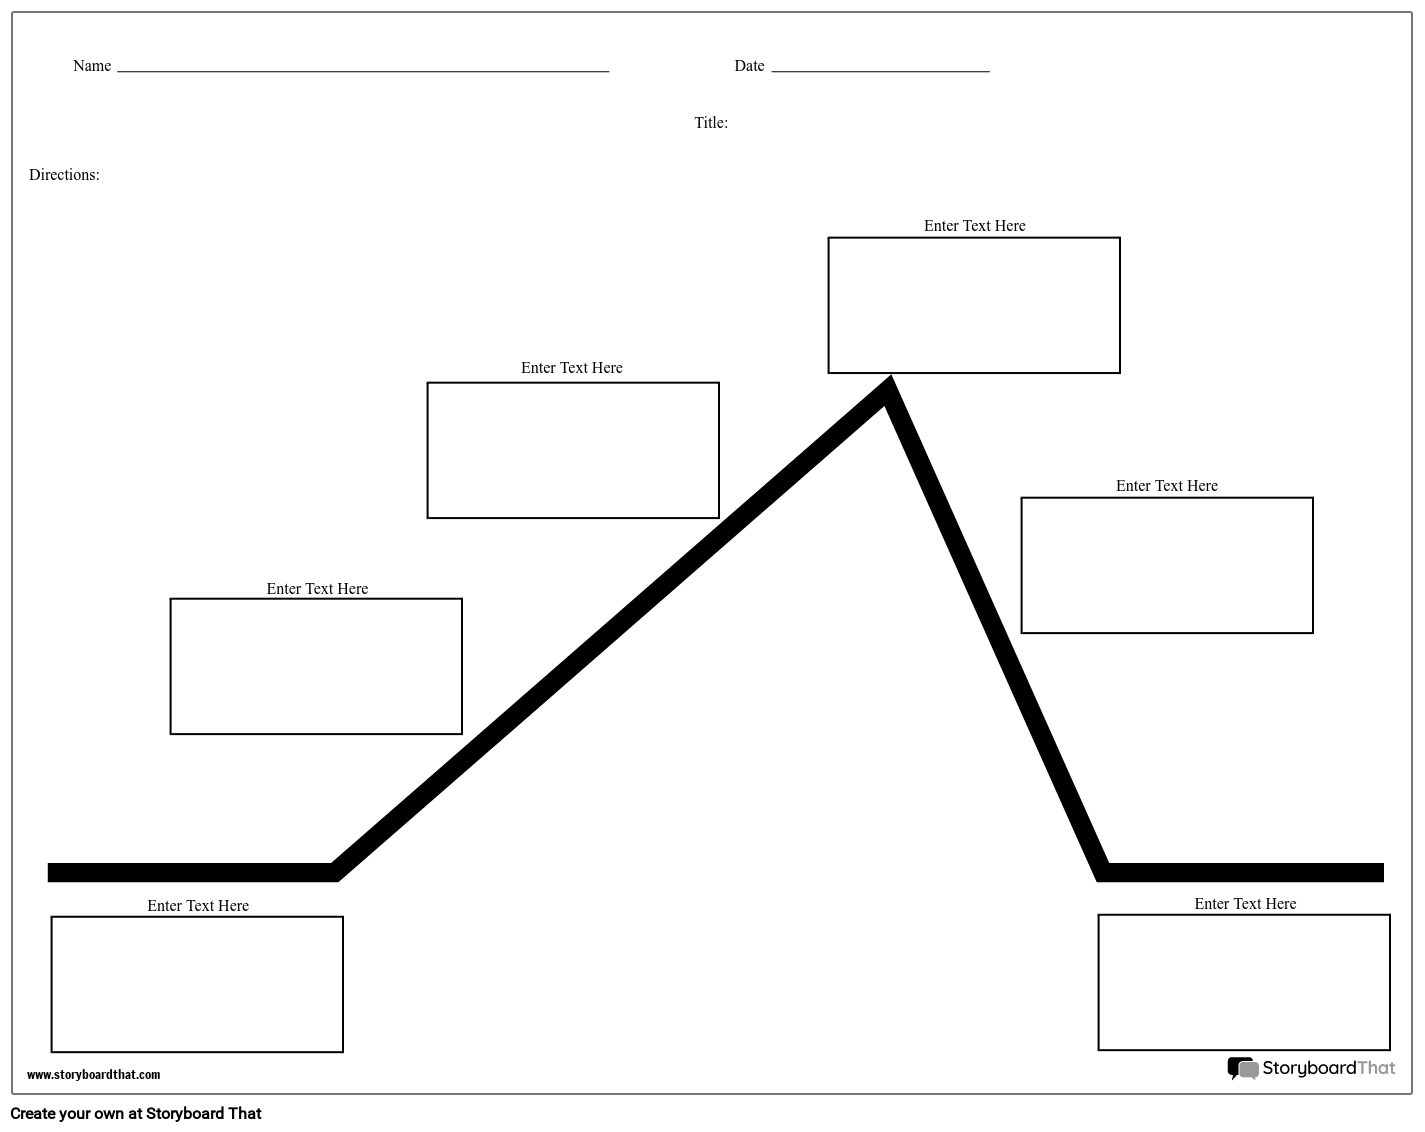 Plot Diagram Storyboard by worksheet-templates